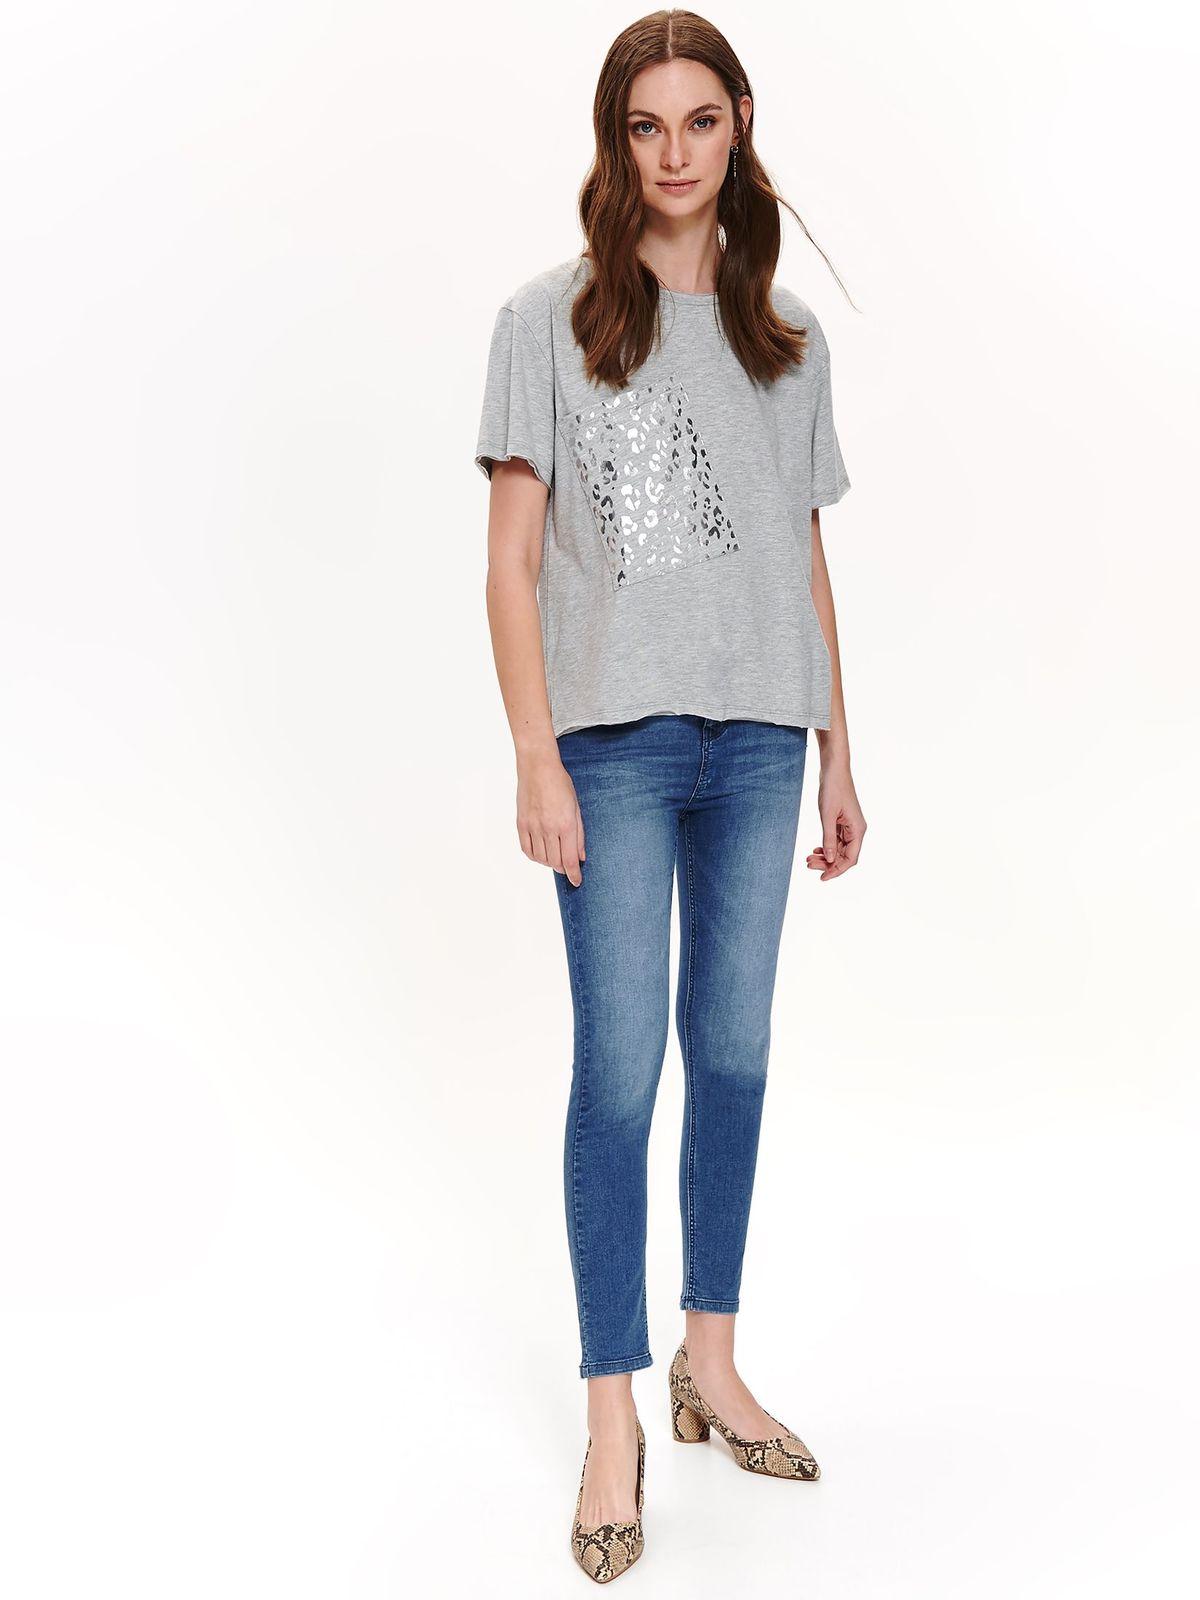 Top Secret lightgrey casual flared t-shirt slightly elastic cotton metallic details